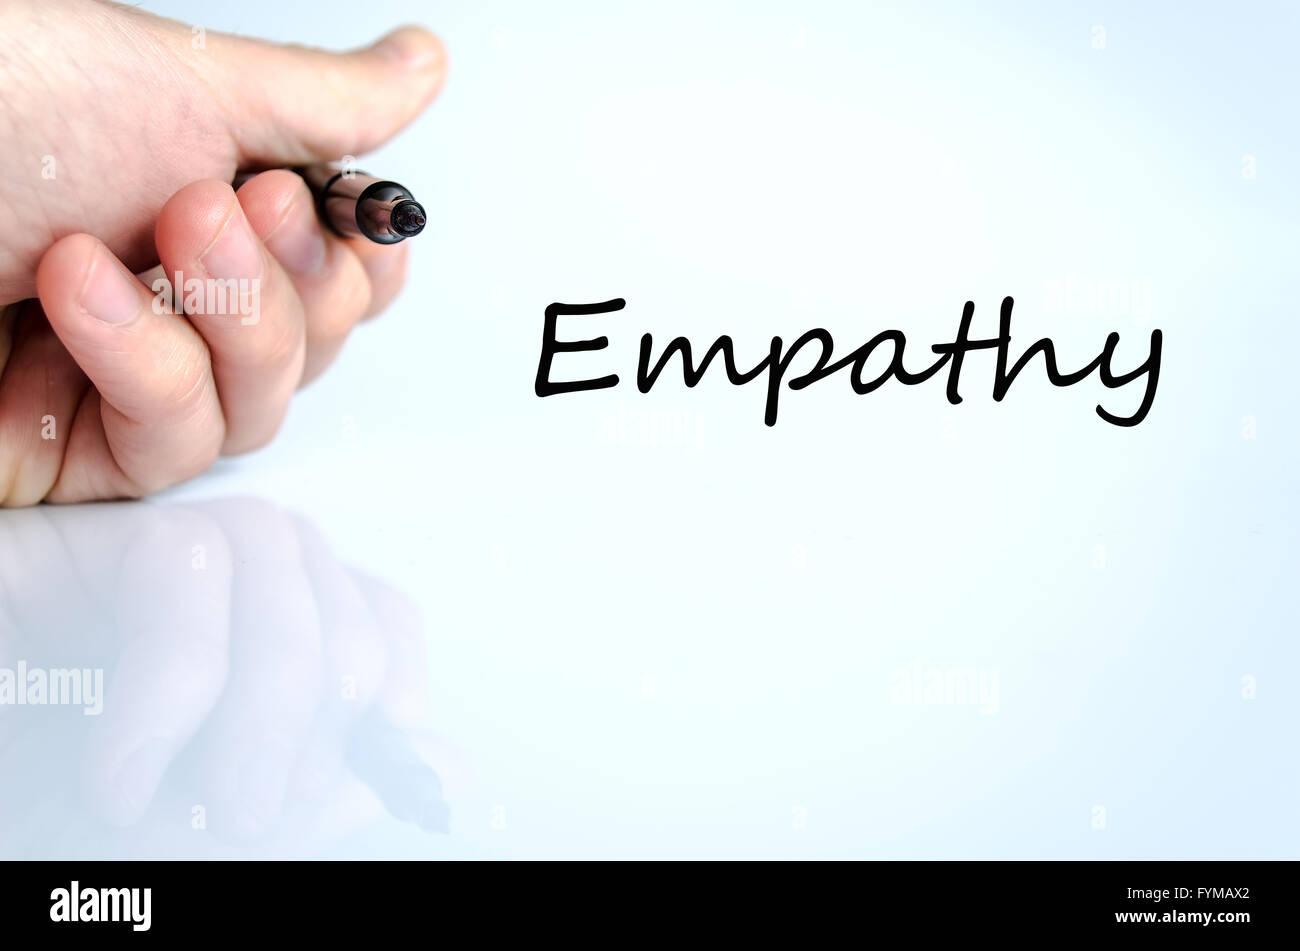 Empathy Text Concept - Stock Image